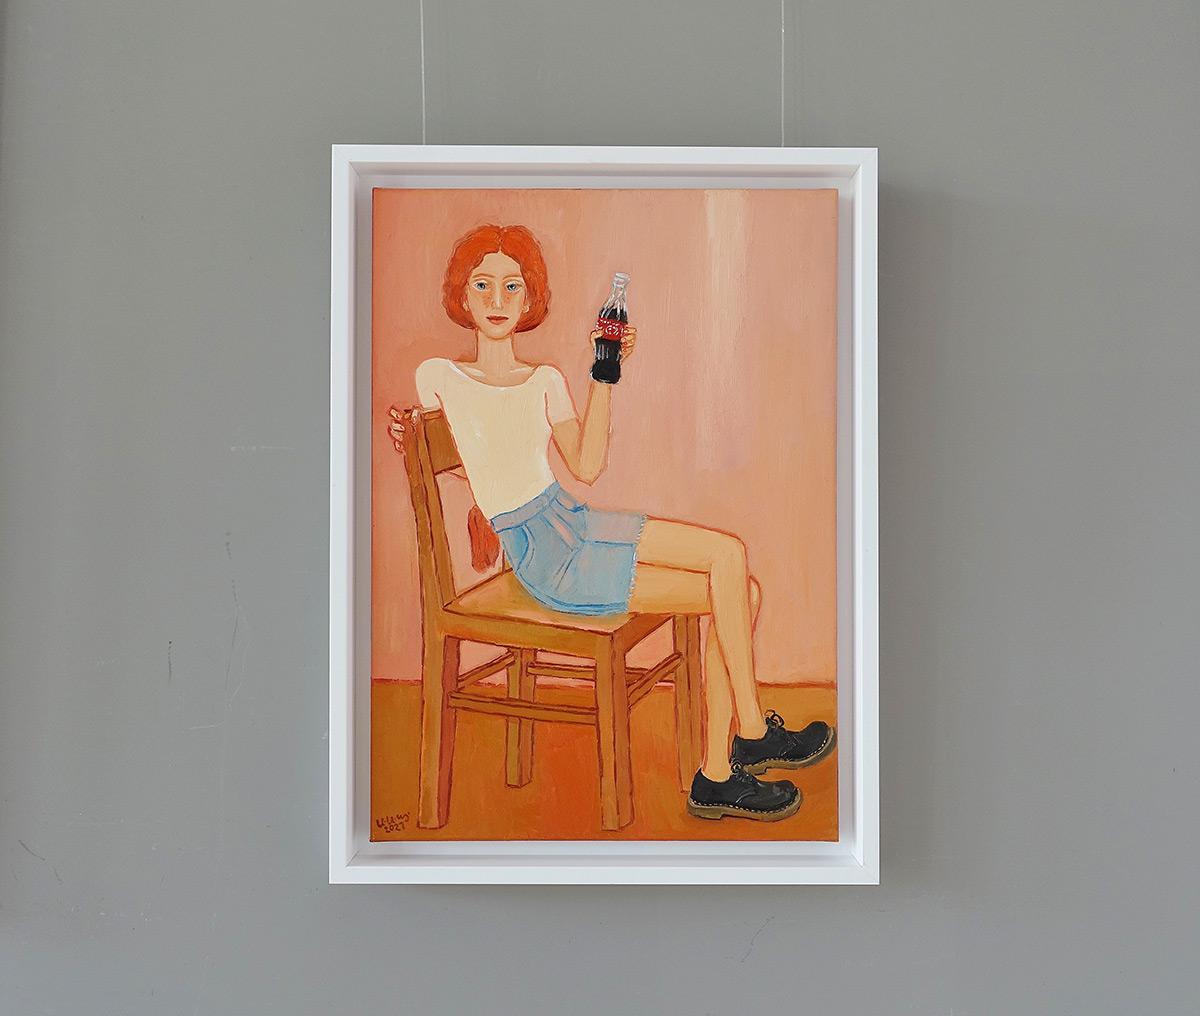 Krzysztof Kokoryn : Redhead with a bottle of Coca Cola